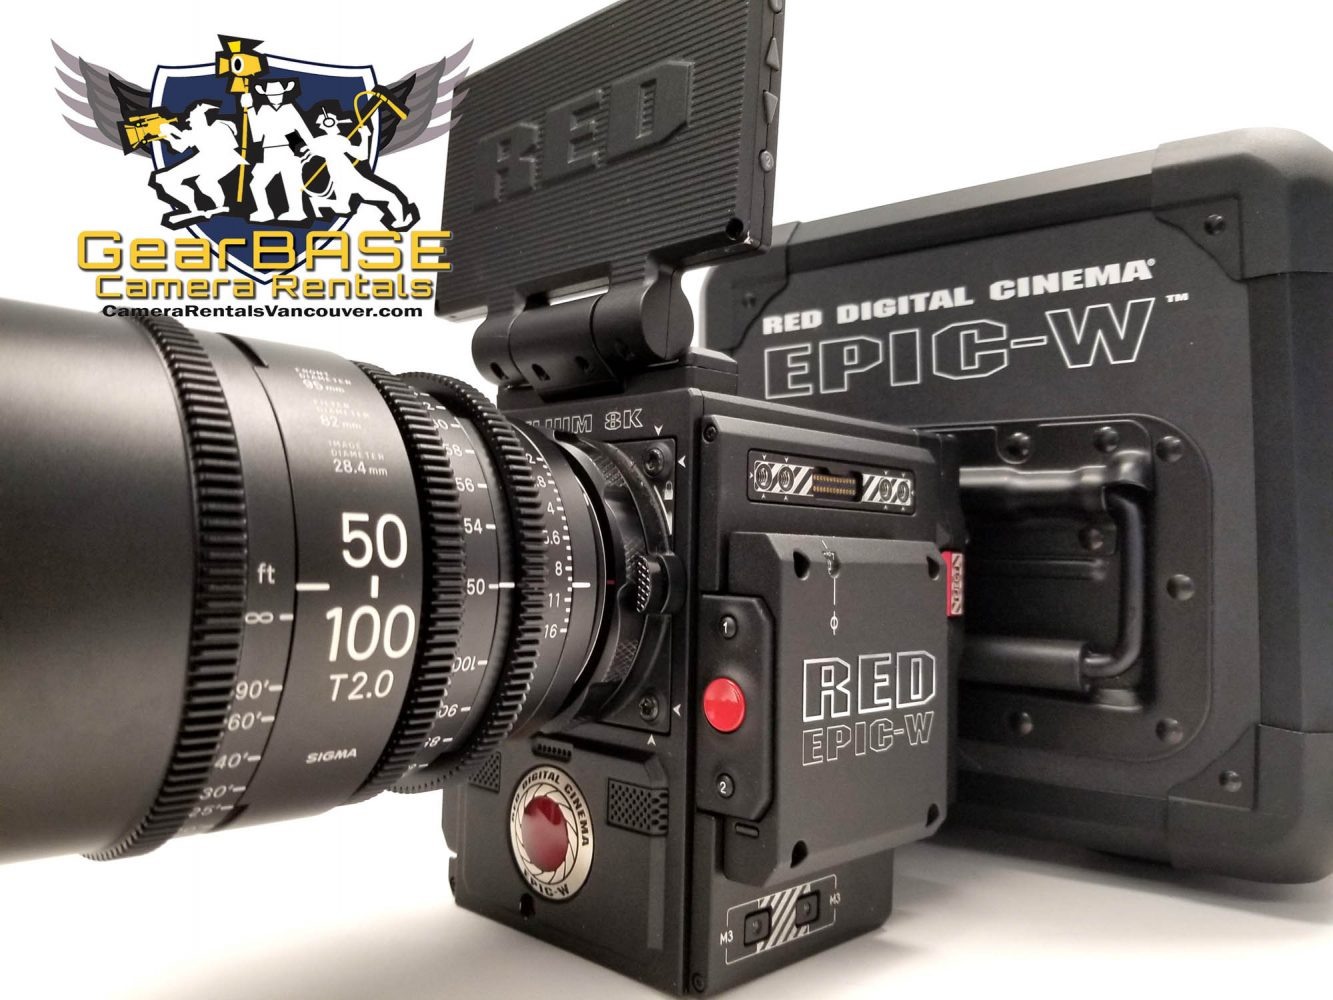 Red Epic W 8k Helium Rental - Camera Rentals Vancouver